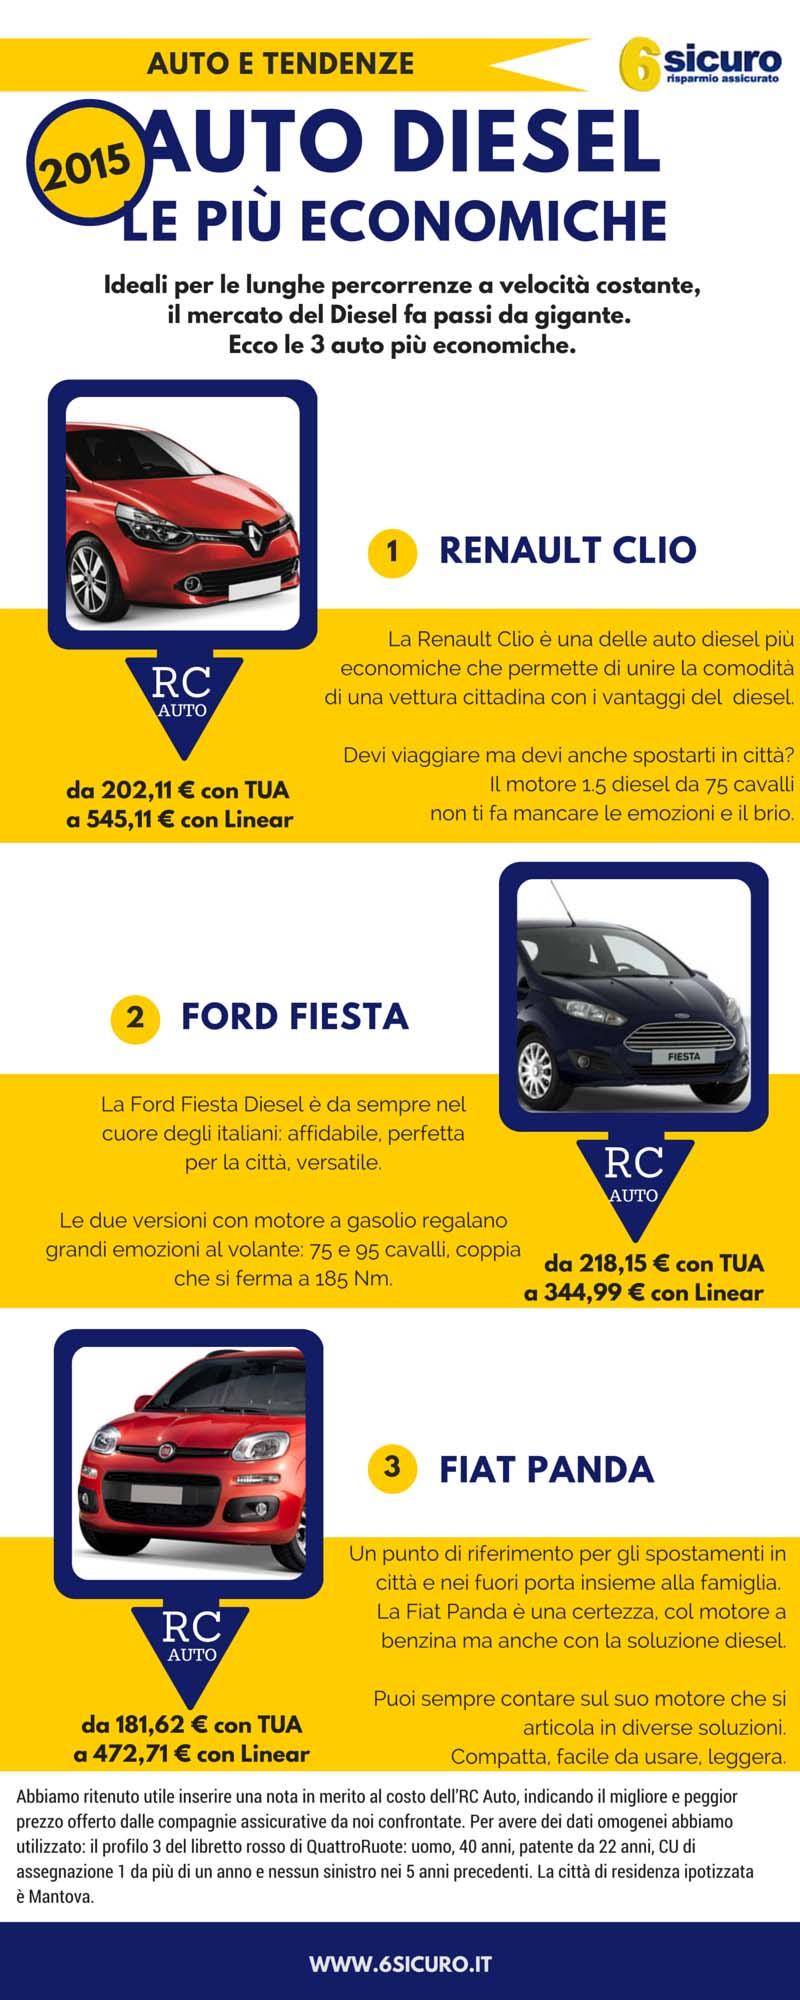 infografica-auto-diesel-6sicuro